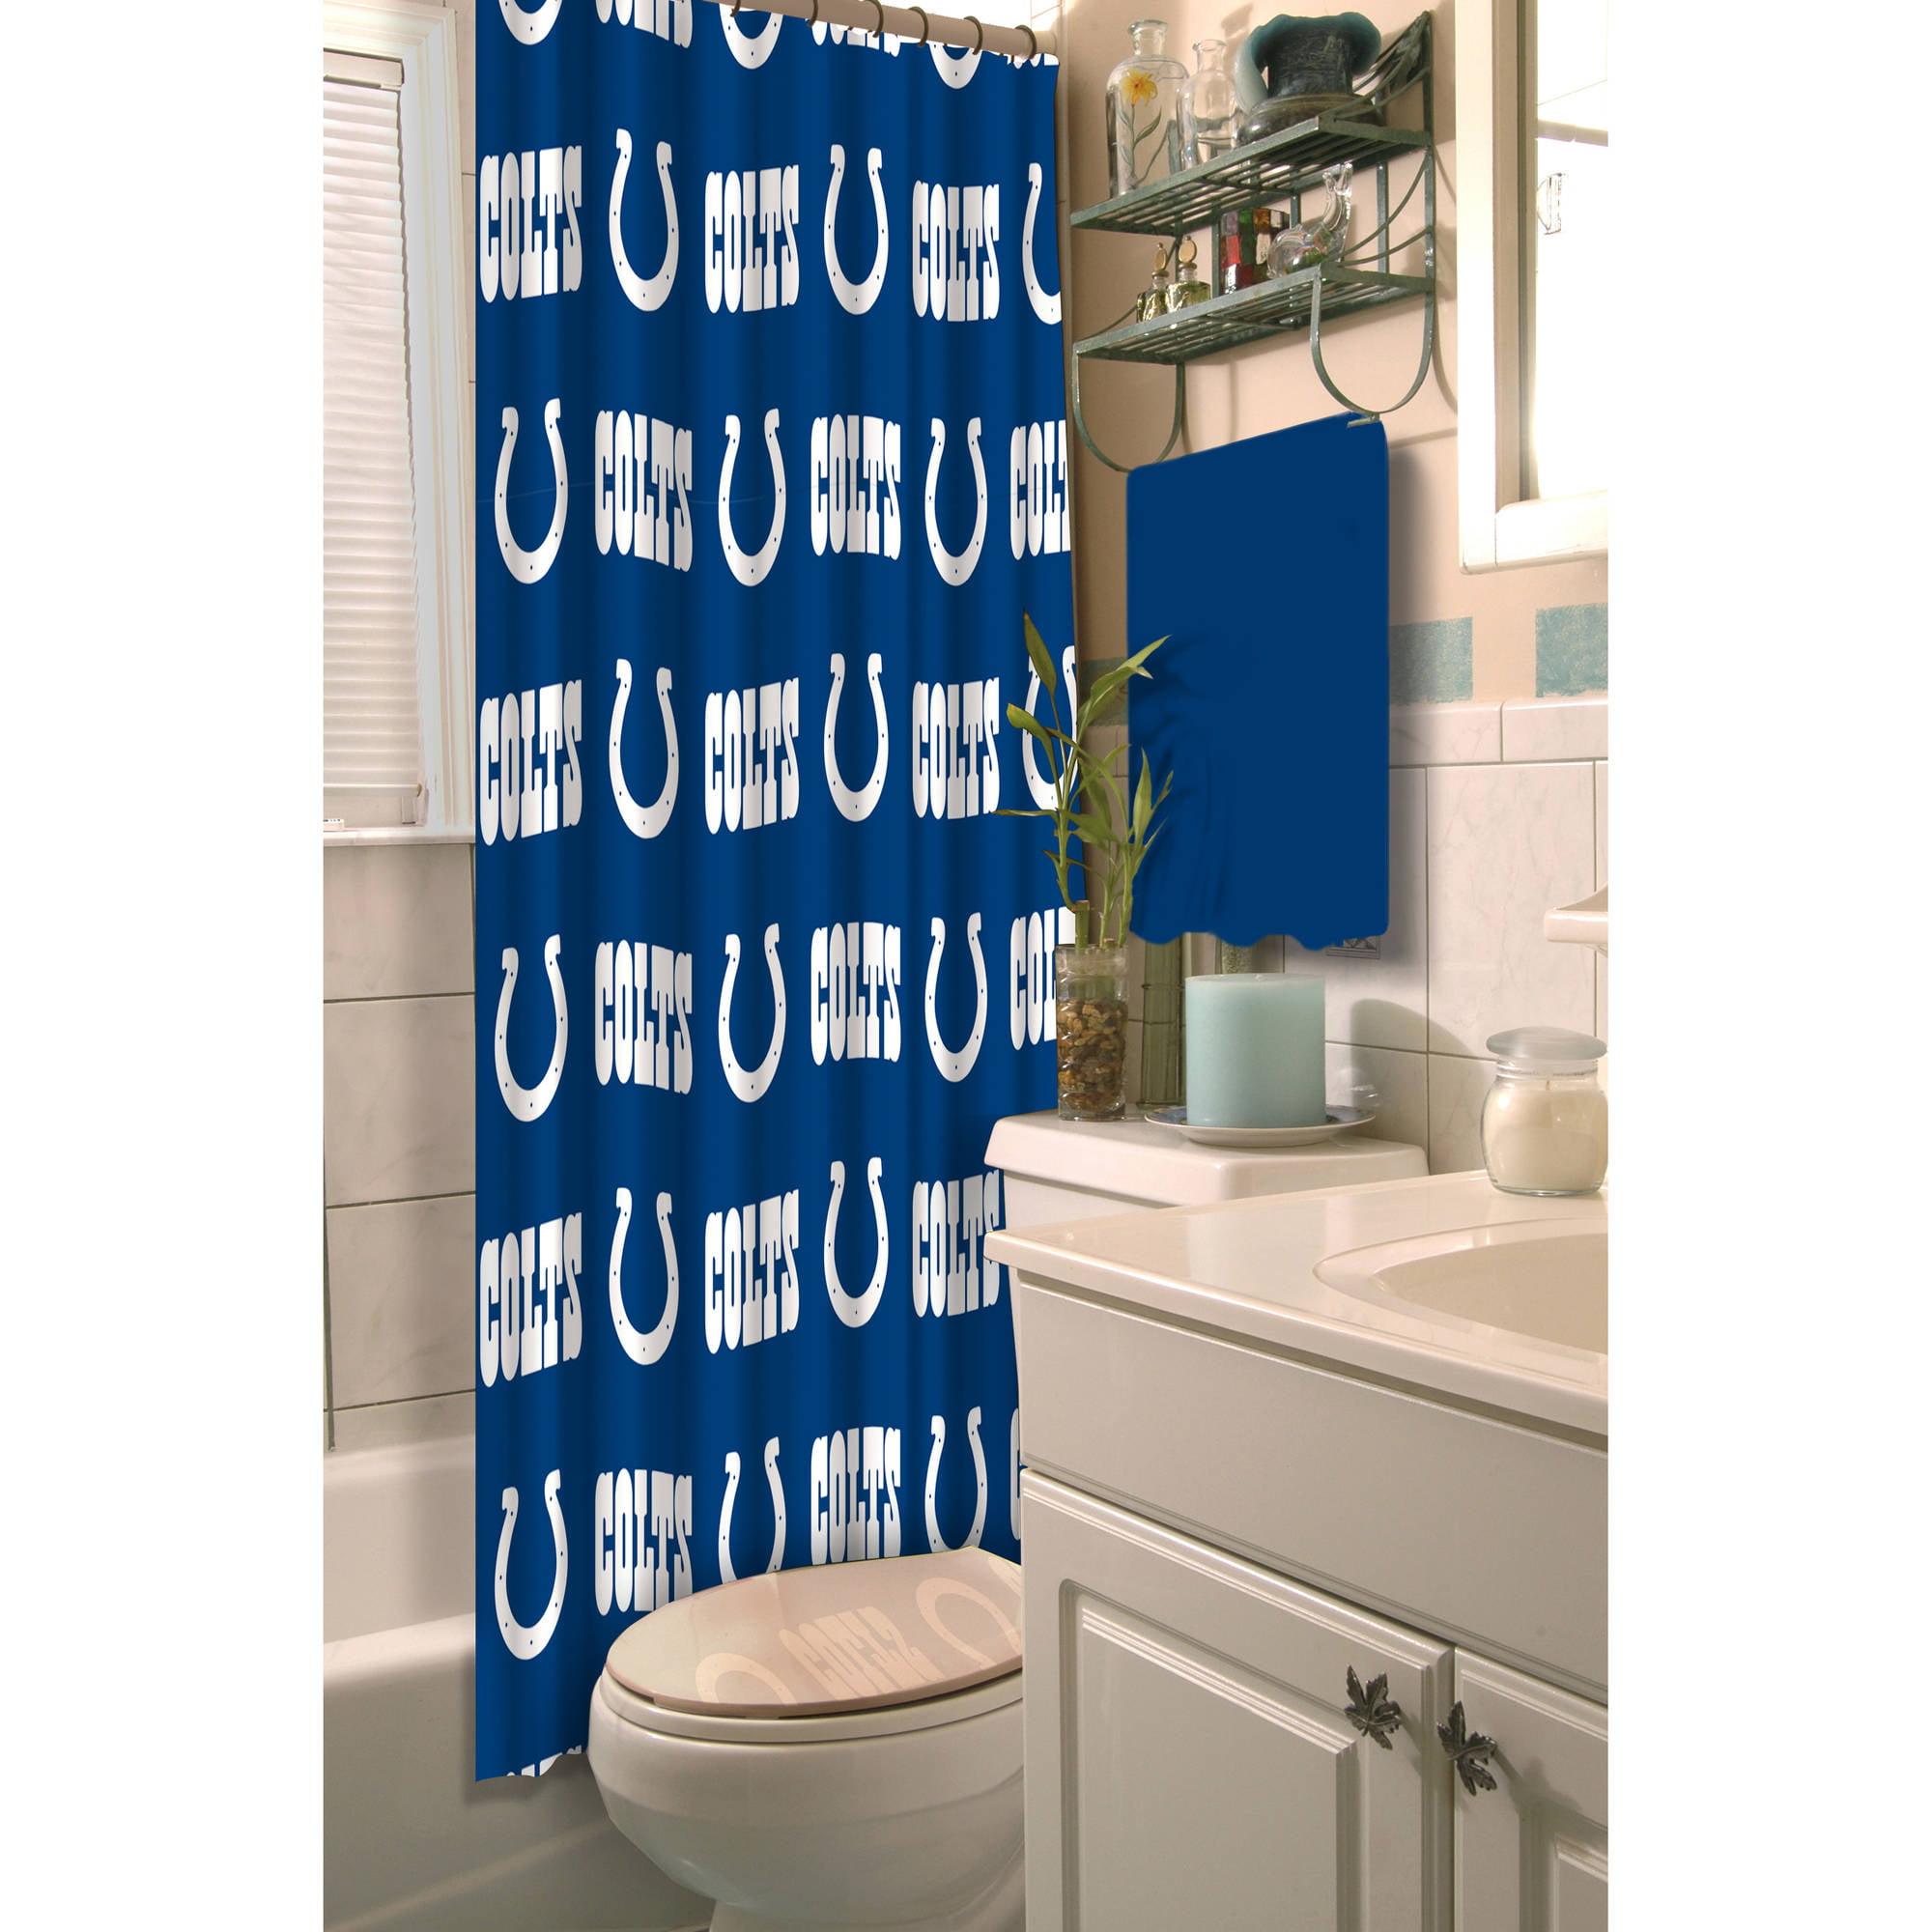 Elegant NFL Indianapolis Colts Decorative Bath Collection Shower Curtain    Walmart.com